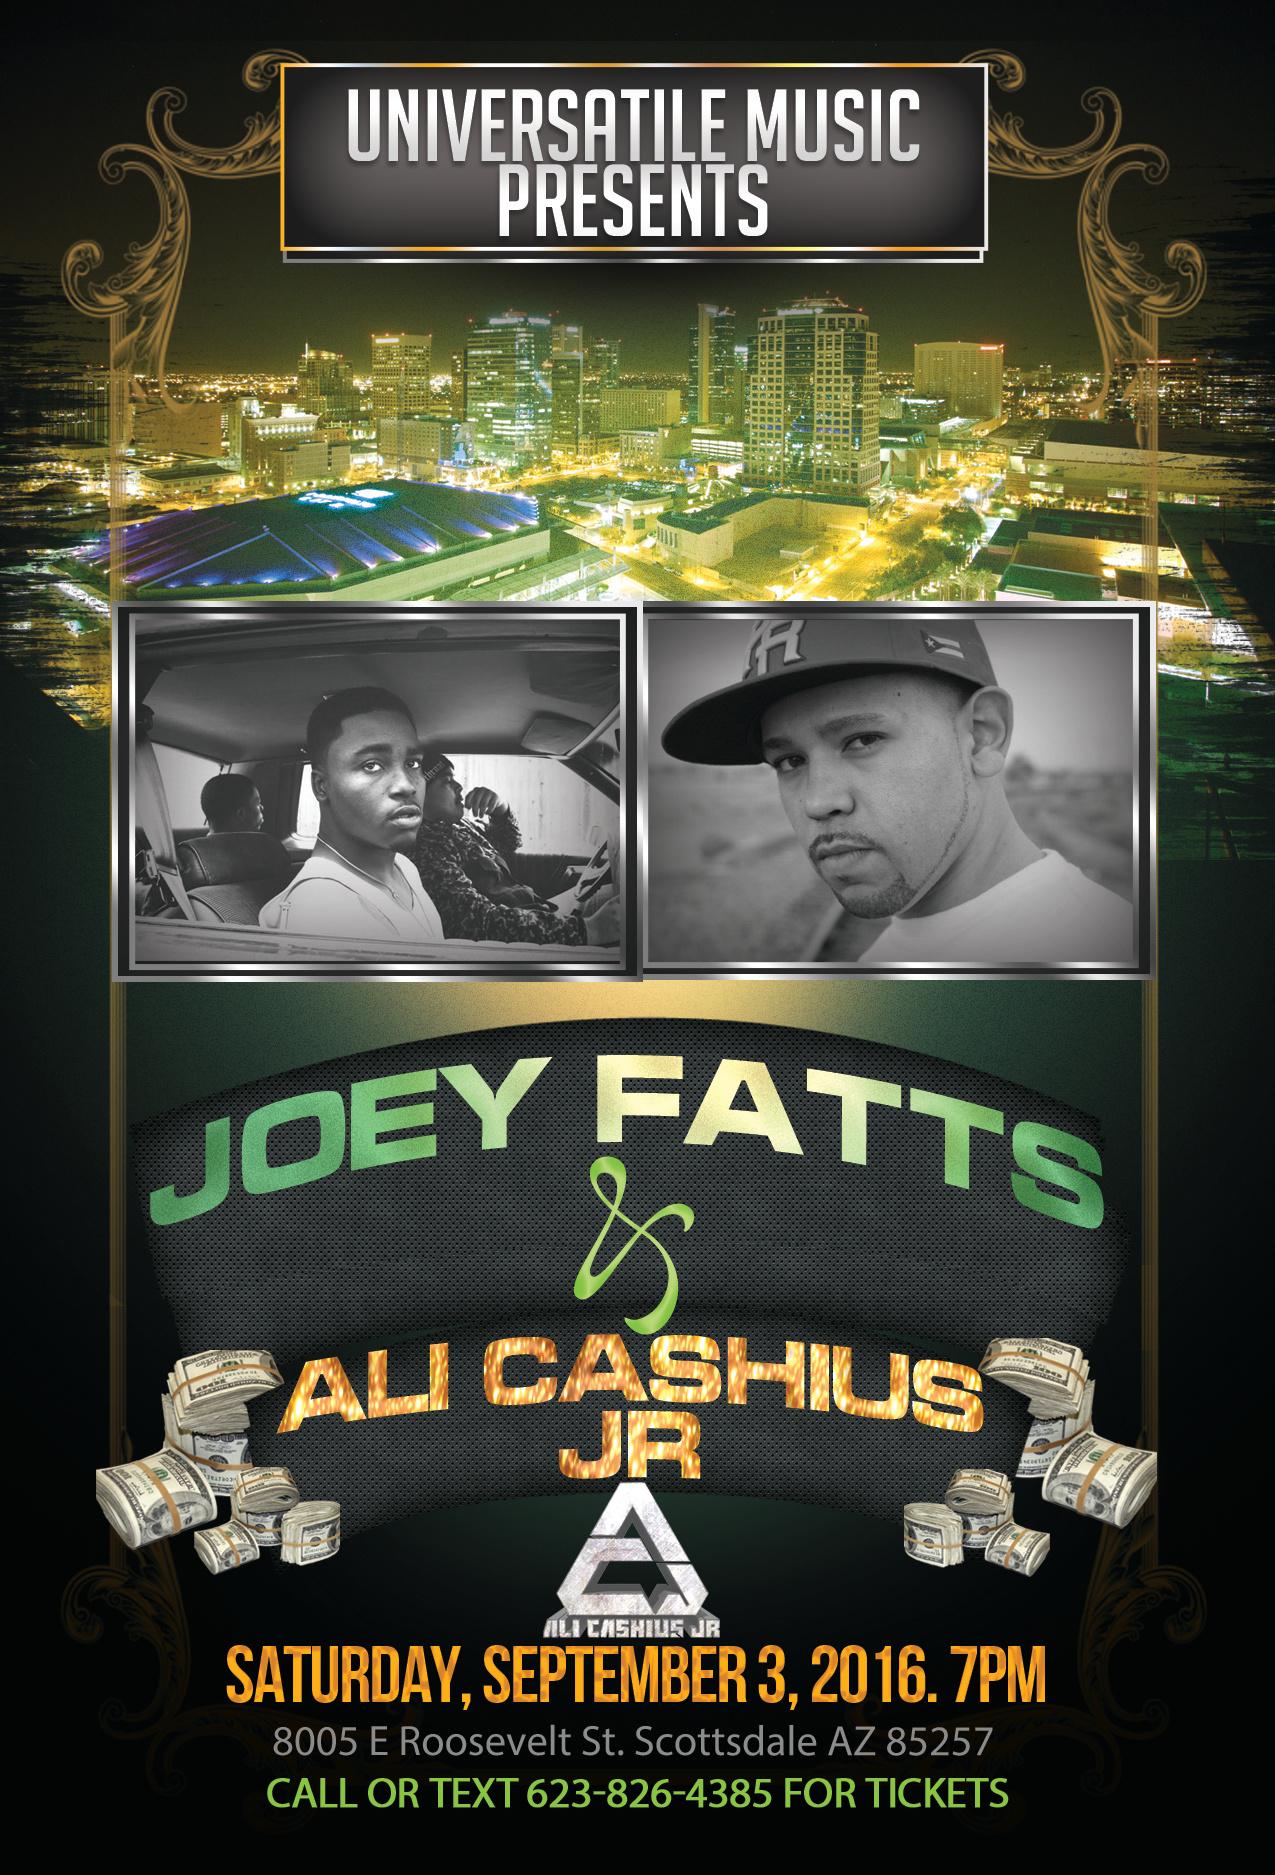 Ali Cashius Jr with Joey Fatts